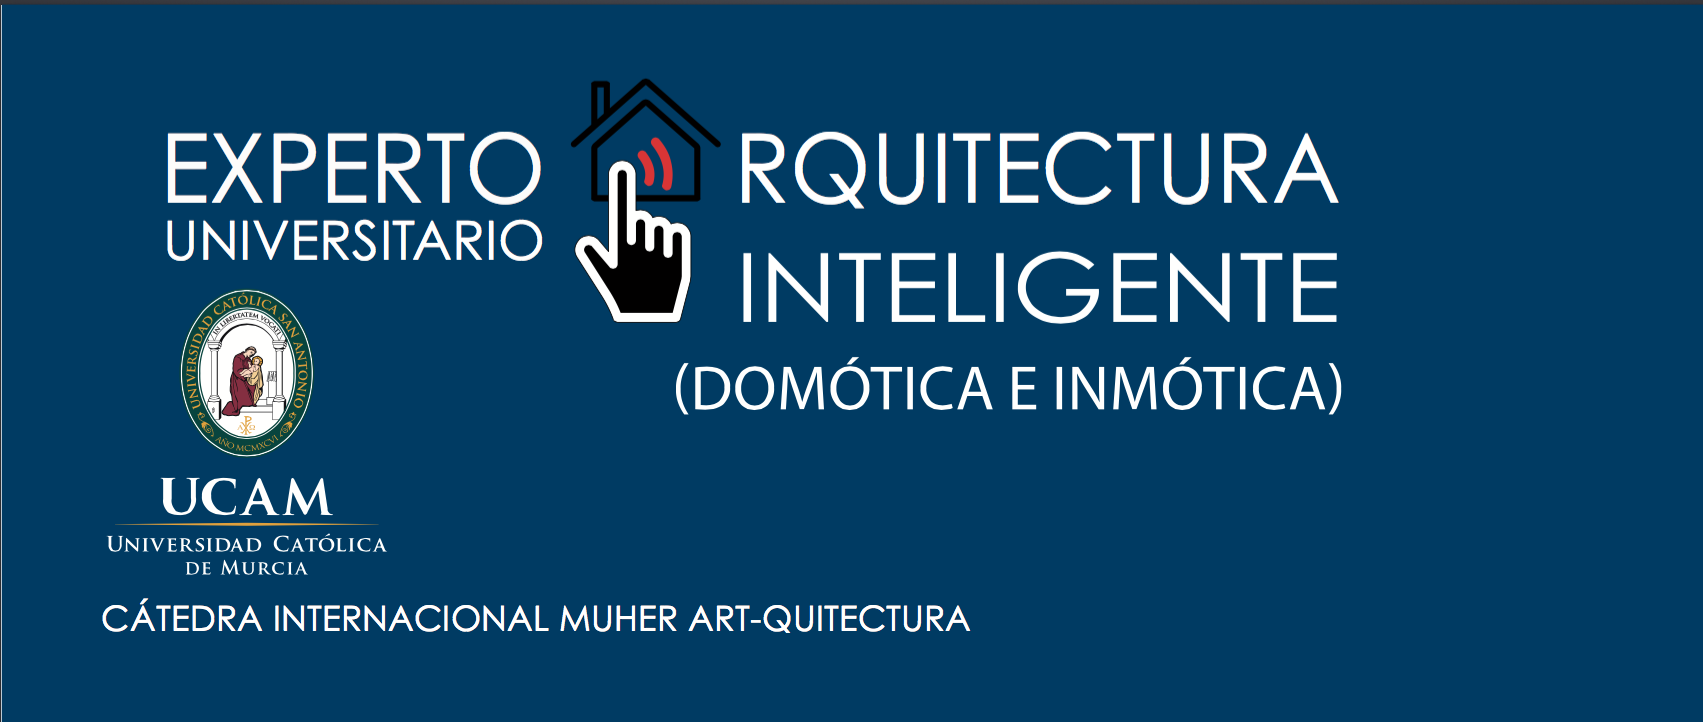 Captura de pantalla 2018 02 22 a las 13.22.41 CÁTEDRA INTERNACIONAL MUHER ART QUITECTURA